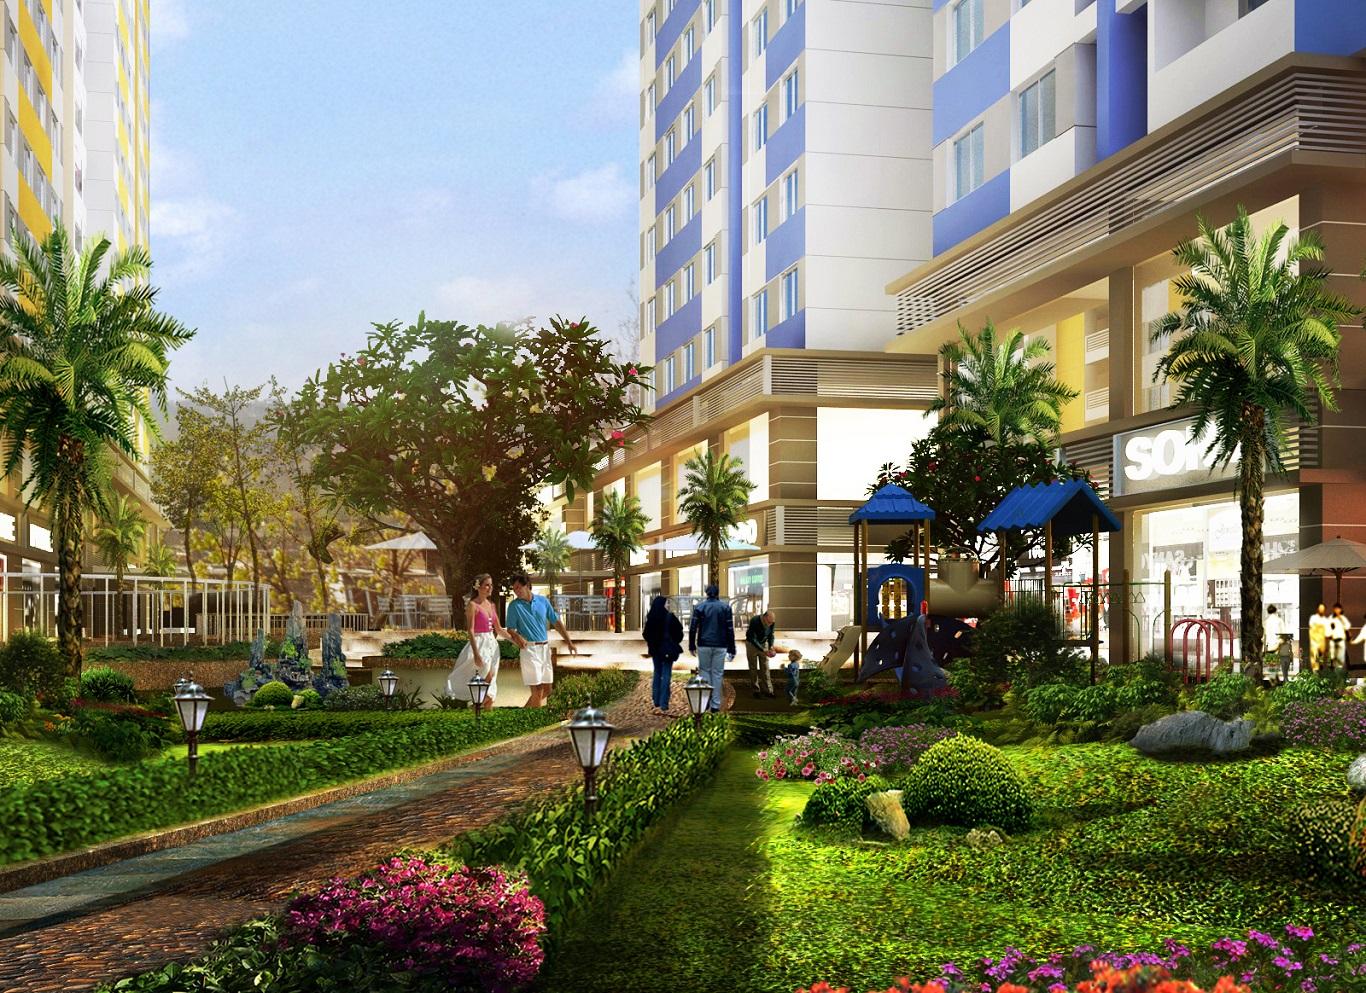 Tiềm năng dự án Grand Central Quận 3